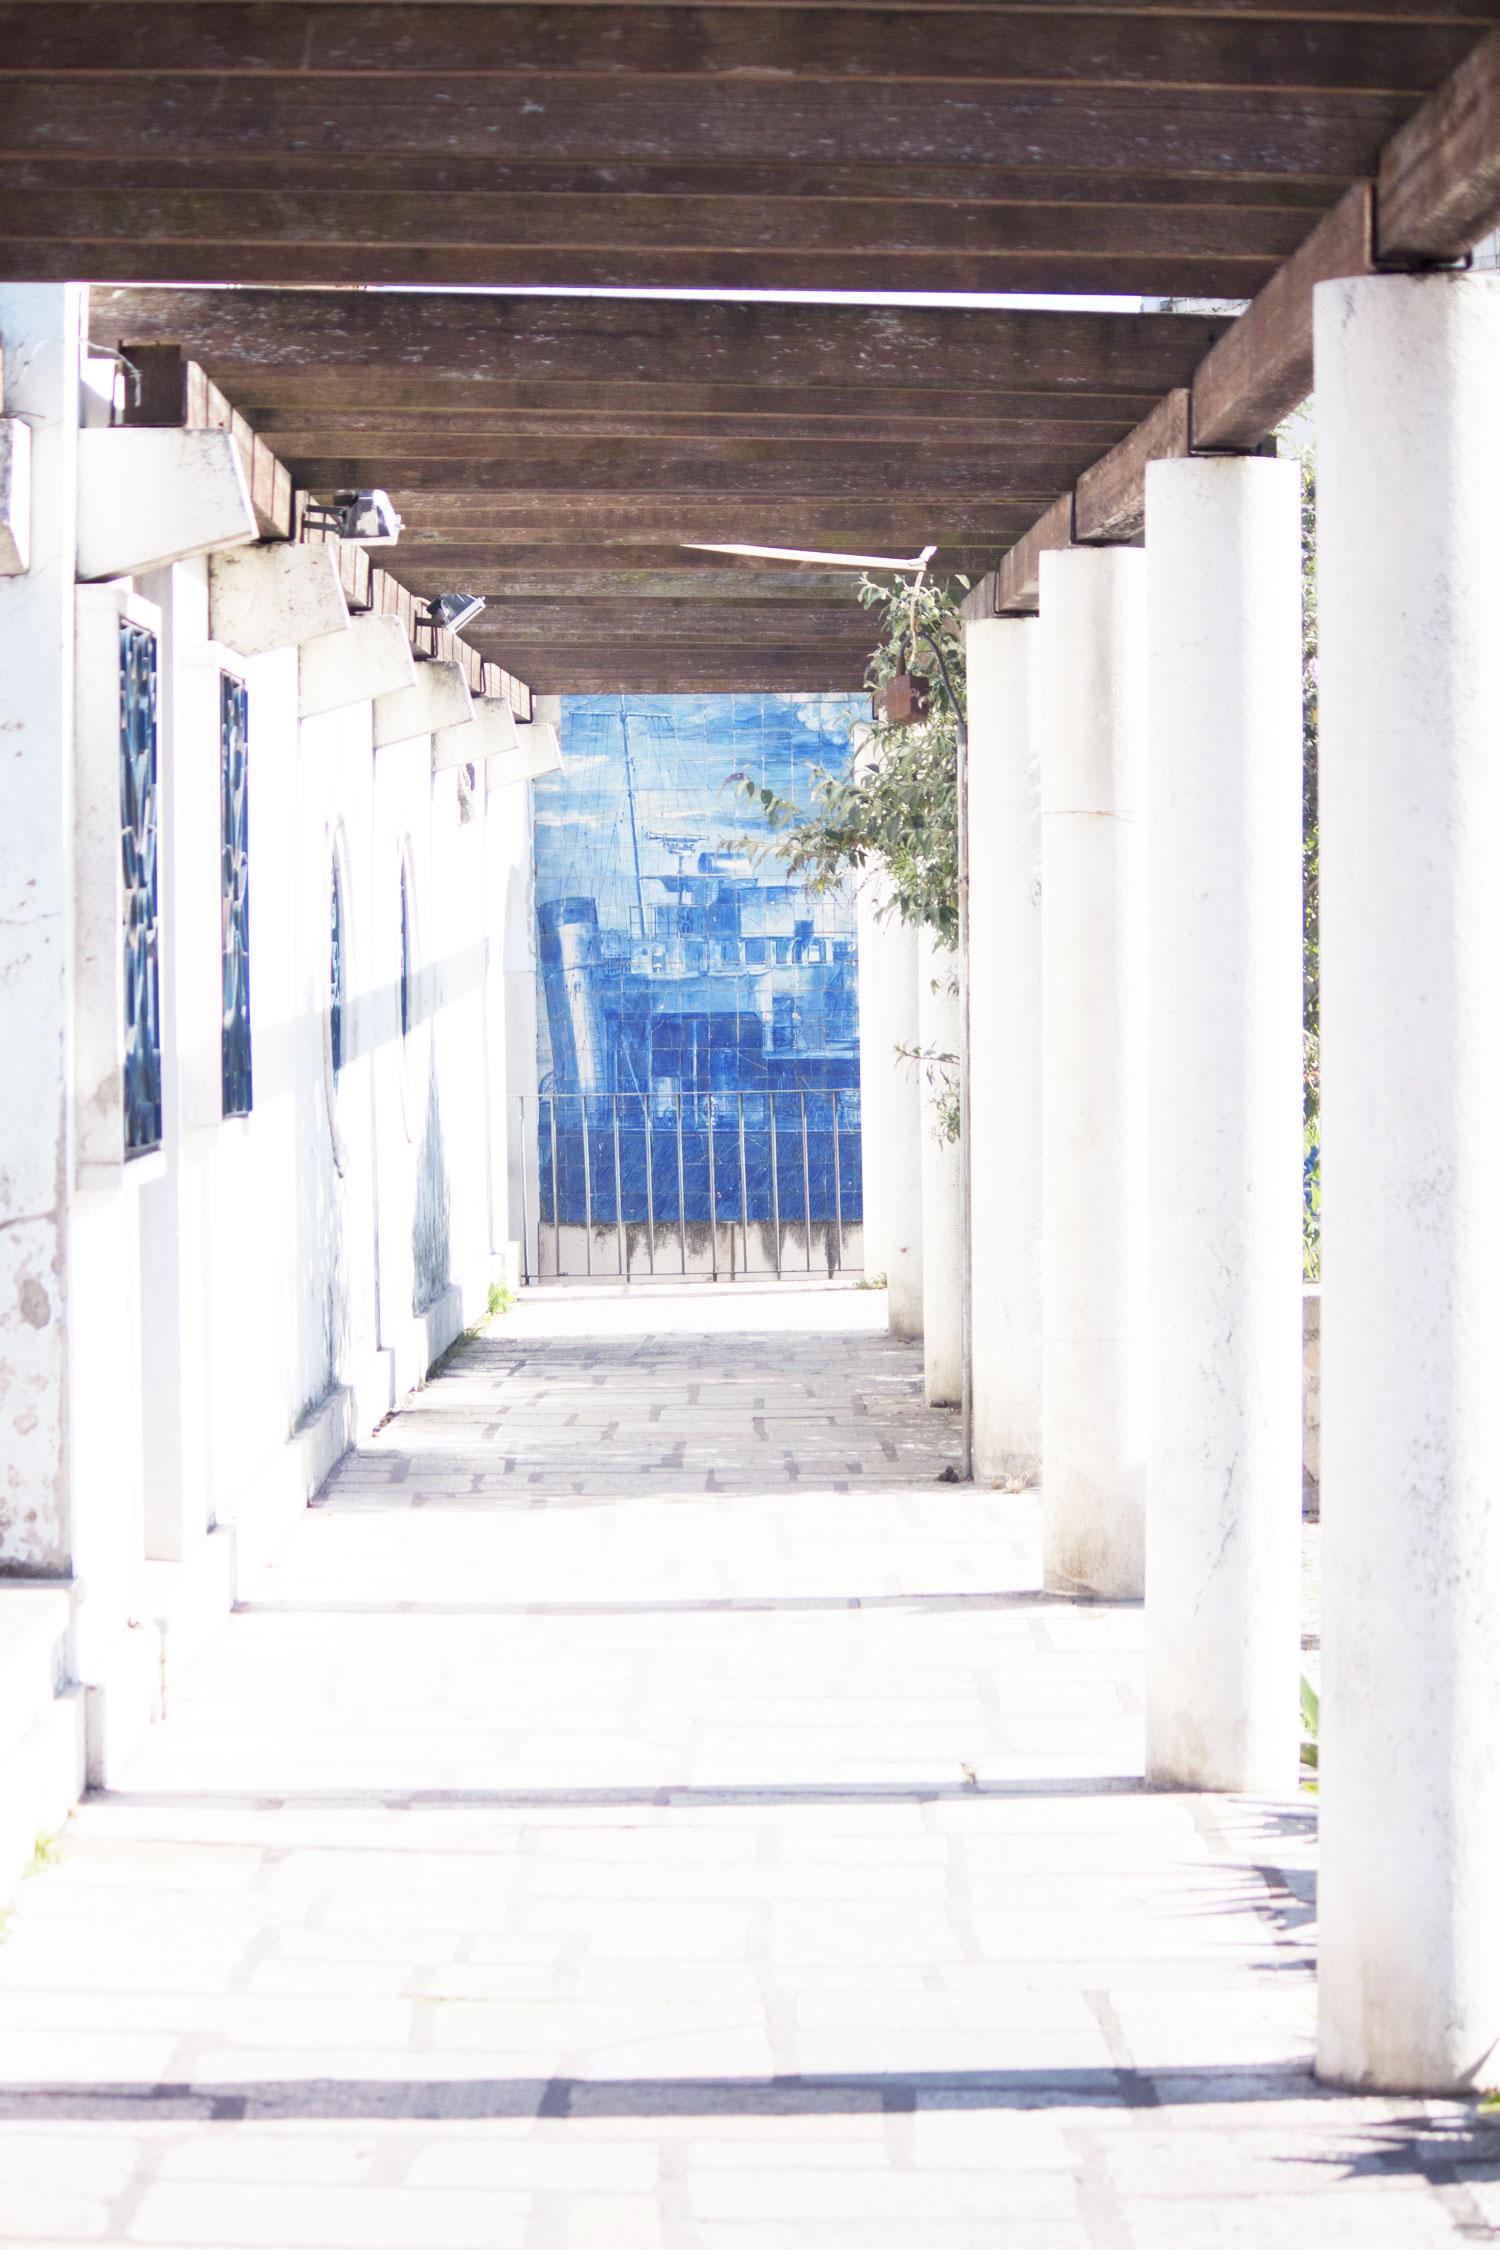 lisbonne_day1.78